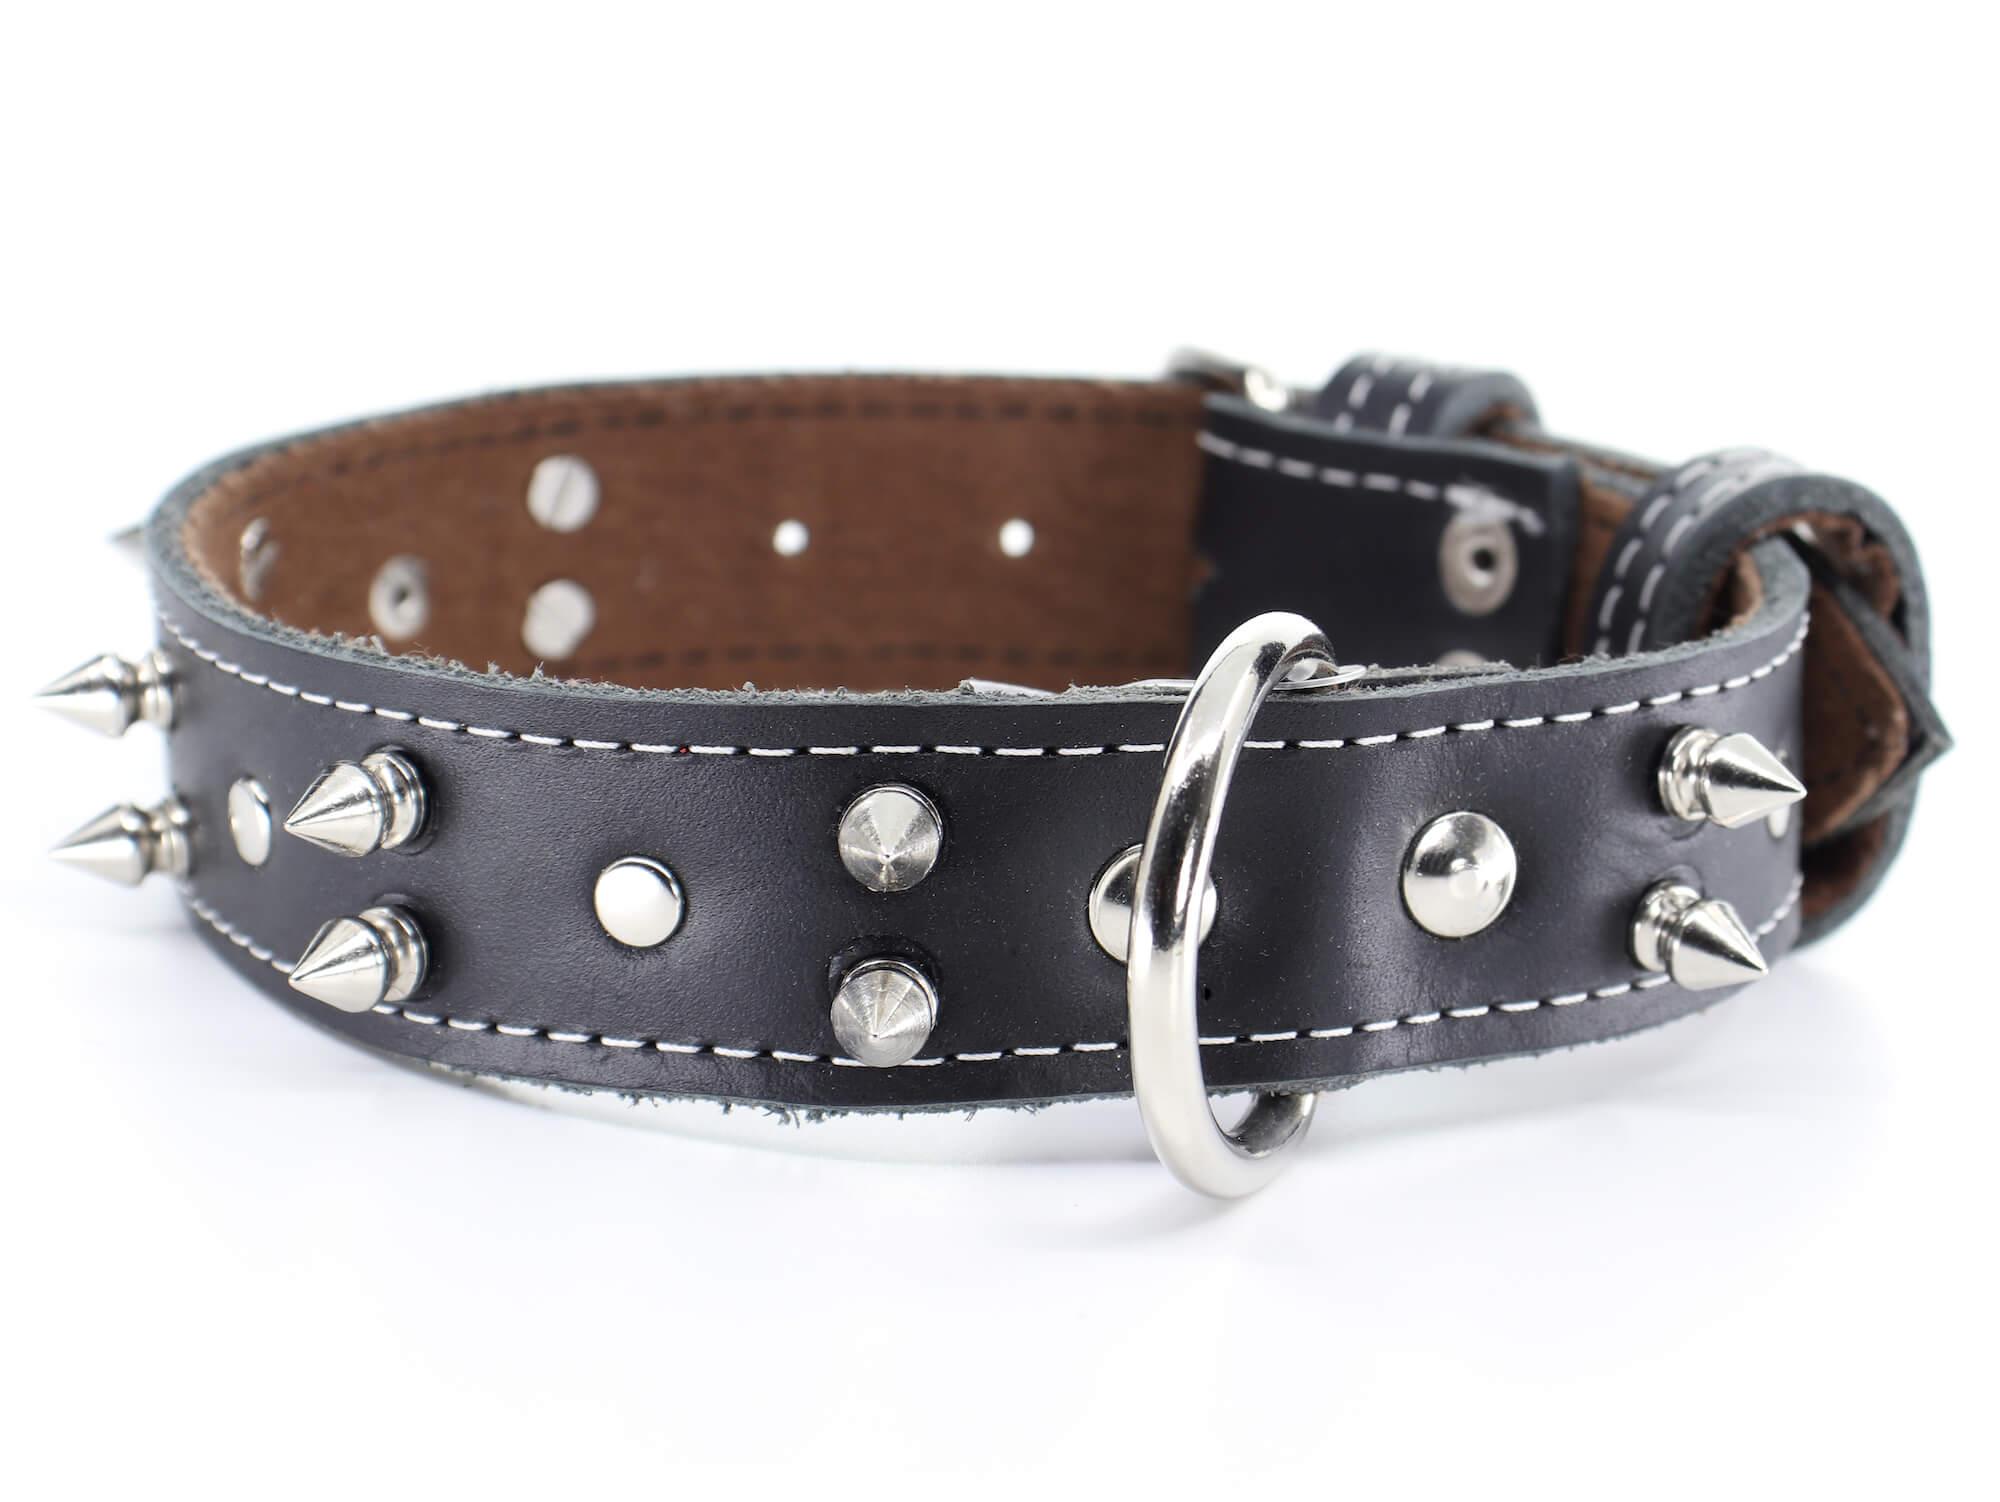 Palkar Apex kožený obojek pro psa s hroty | 22 – 65 cm Barva: Černá, Obvod krku: 46,5 - 55 cm, Šířka: 3 cm